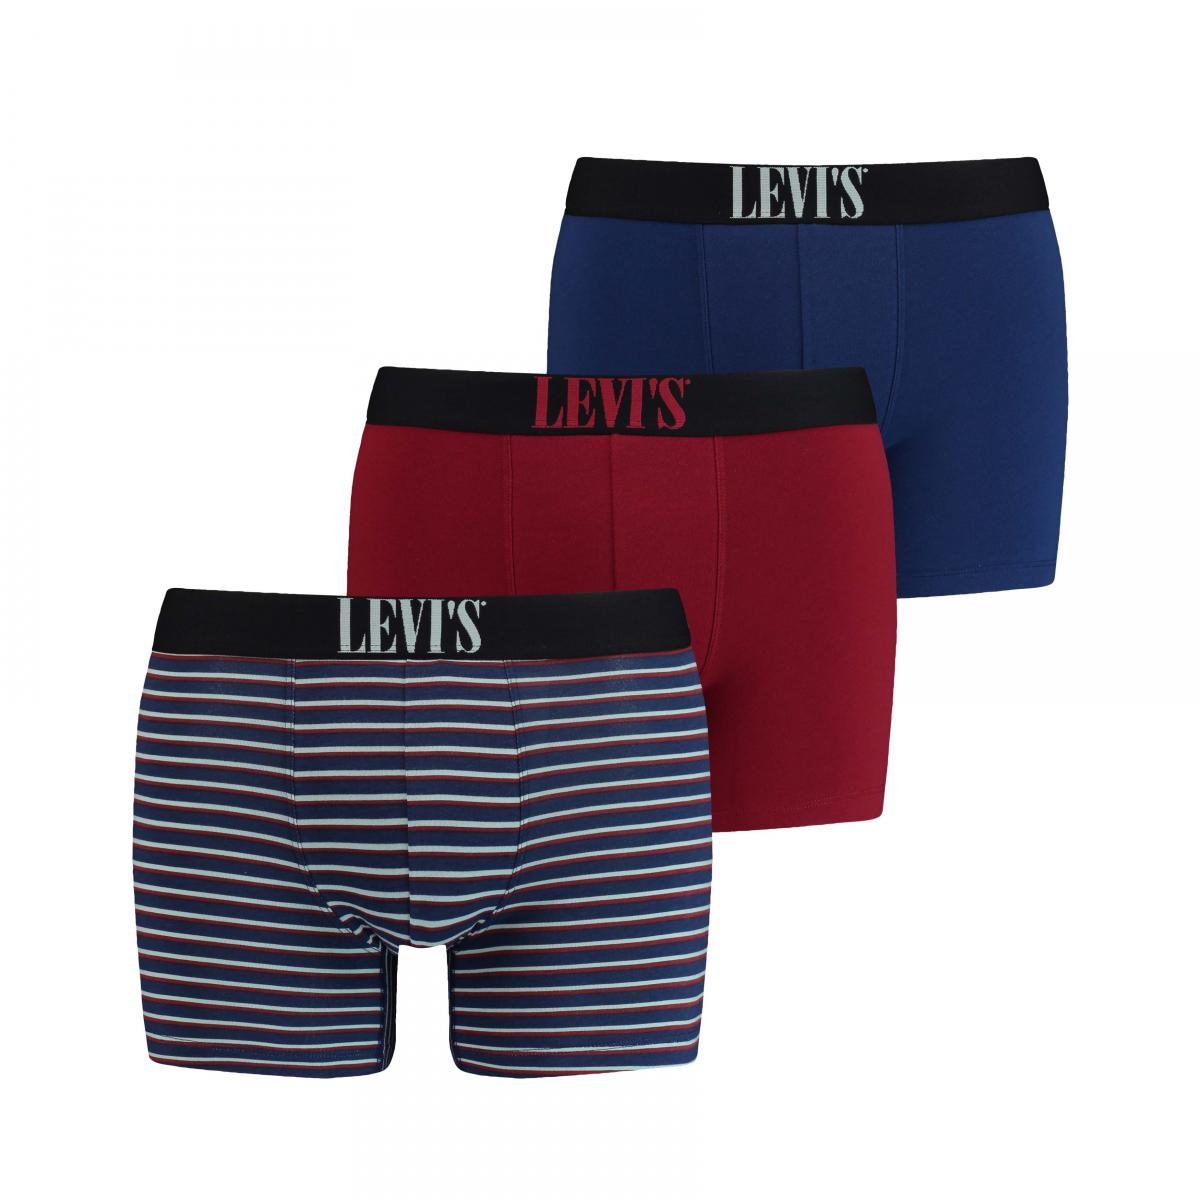 Promo : Pack de 3 boxers Bleus/rouge - Levi?s Underwear - Levi's Underwear - Modalova